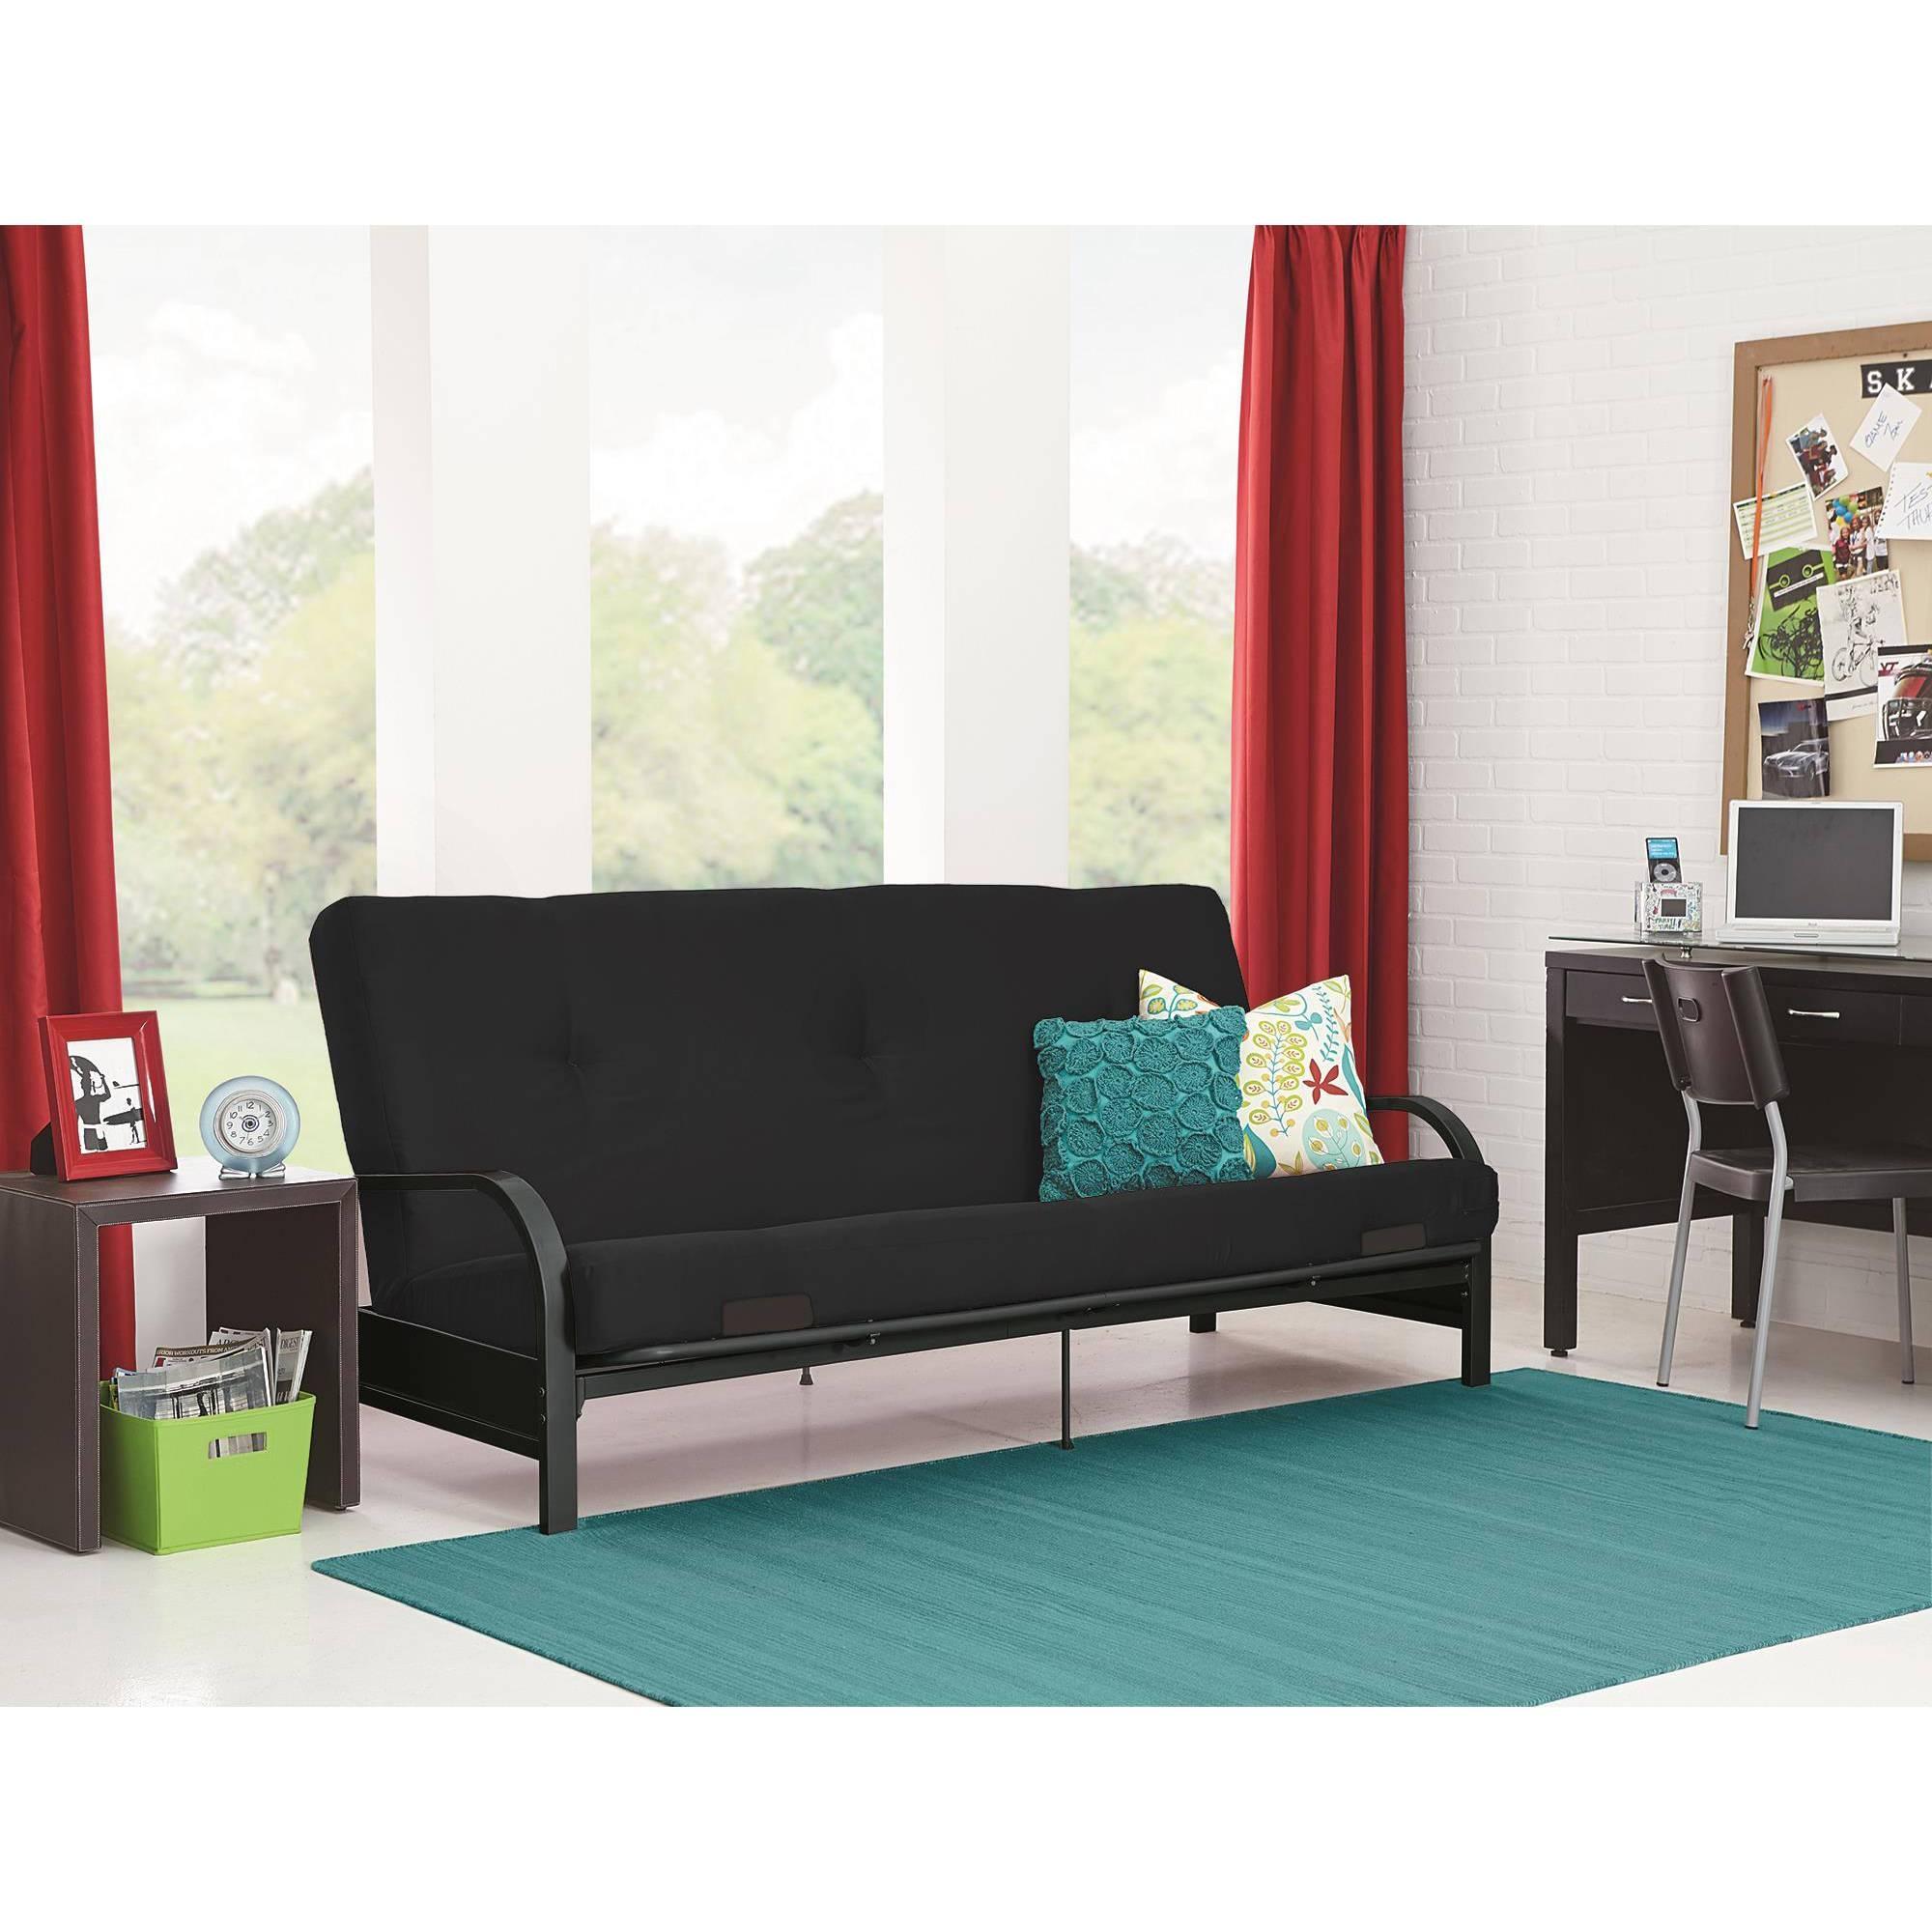 Futons, Futon Beds, Sofa Beds - Walmart inside Fulton Sofa Beds (Image 23 of 30)